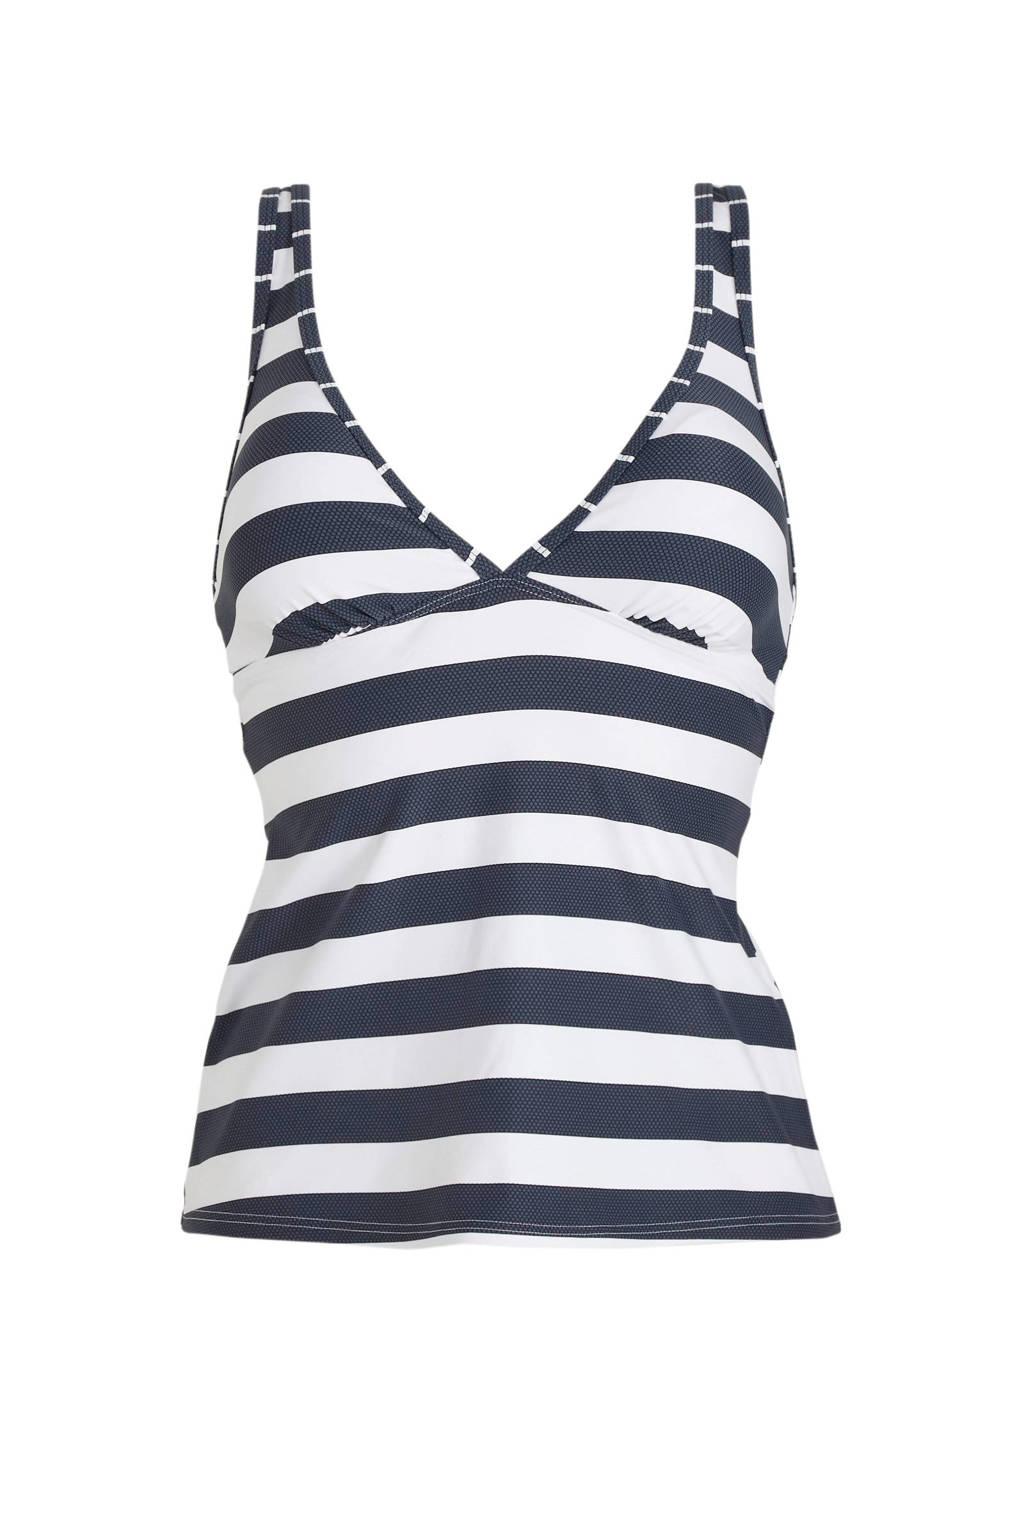 ESPRIT Women Beach gestreepte tankini bikinitop donkerblauw/wit, Donkerblauw/wit